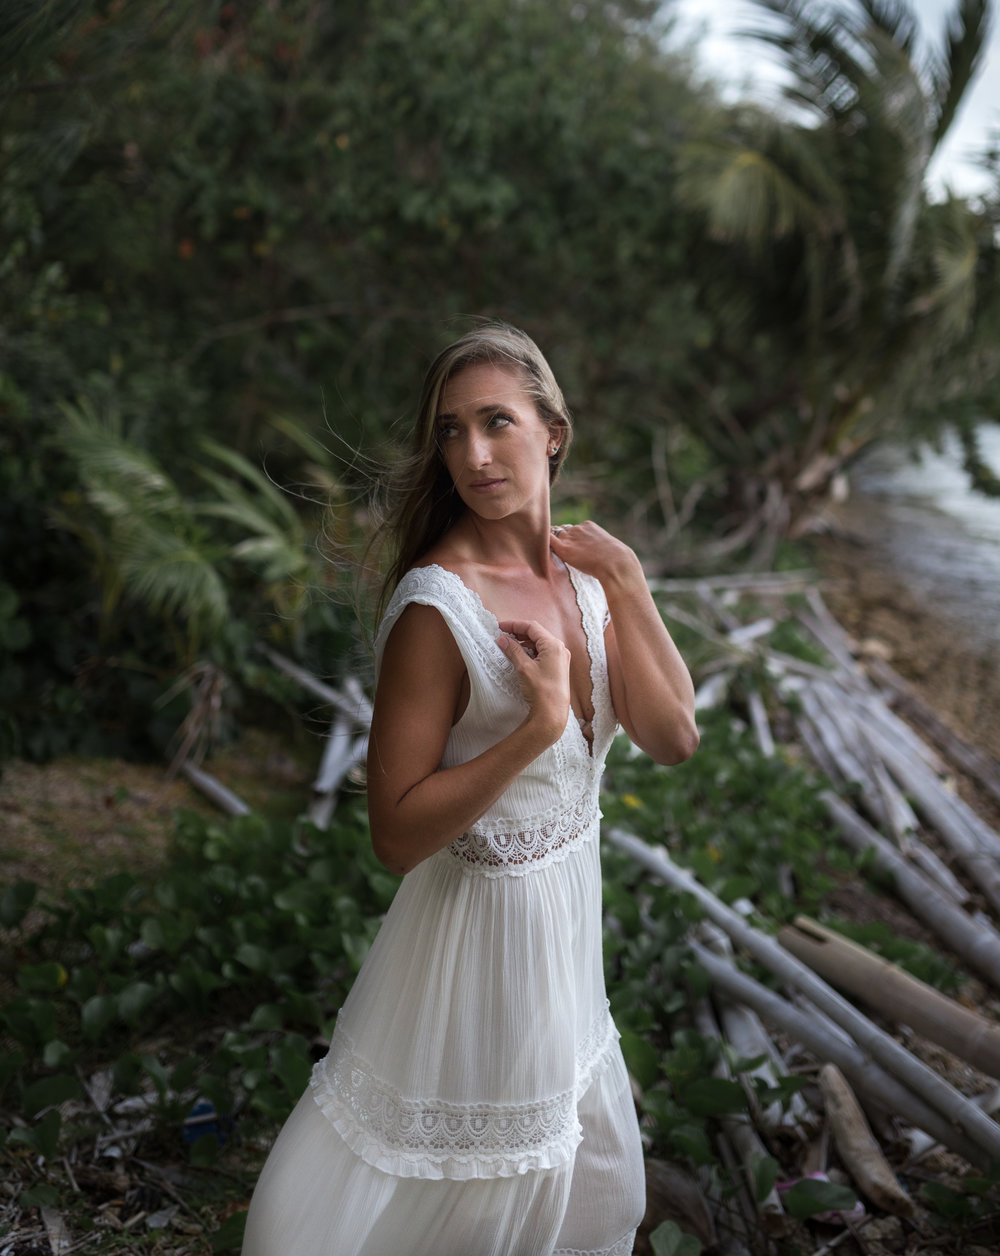 woman-guam-portrait-photographer-ipan-roxanne-augusta-5.jpg